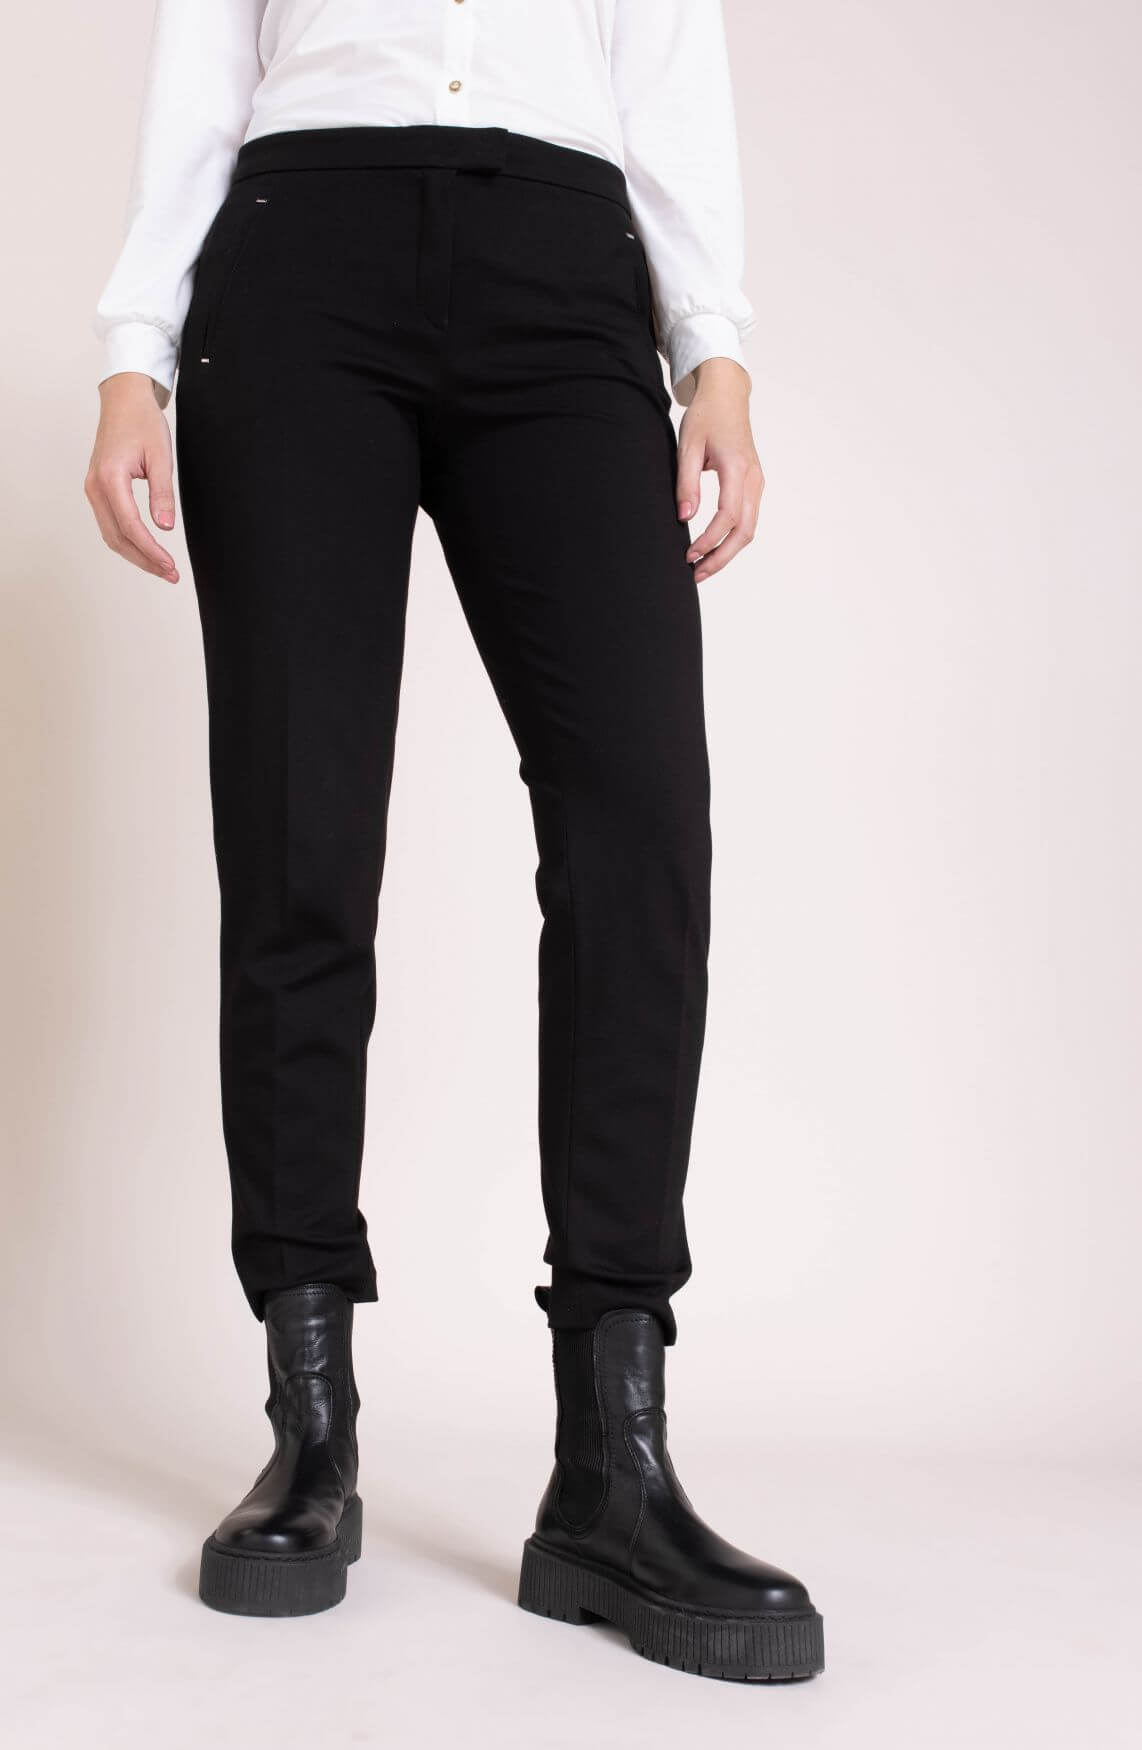 Rosner Dames L30 Alisa pantalon Zwart